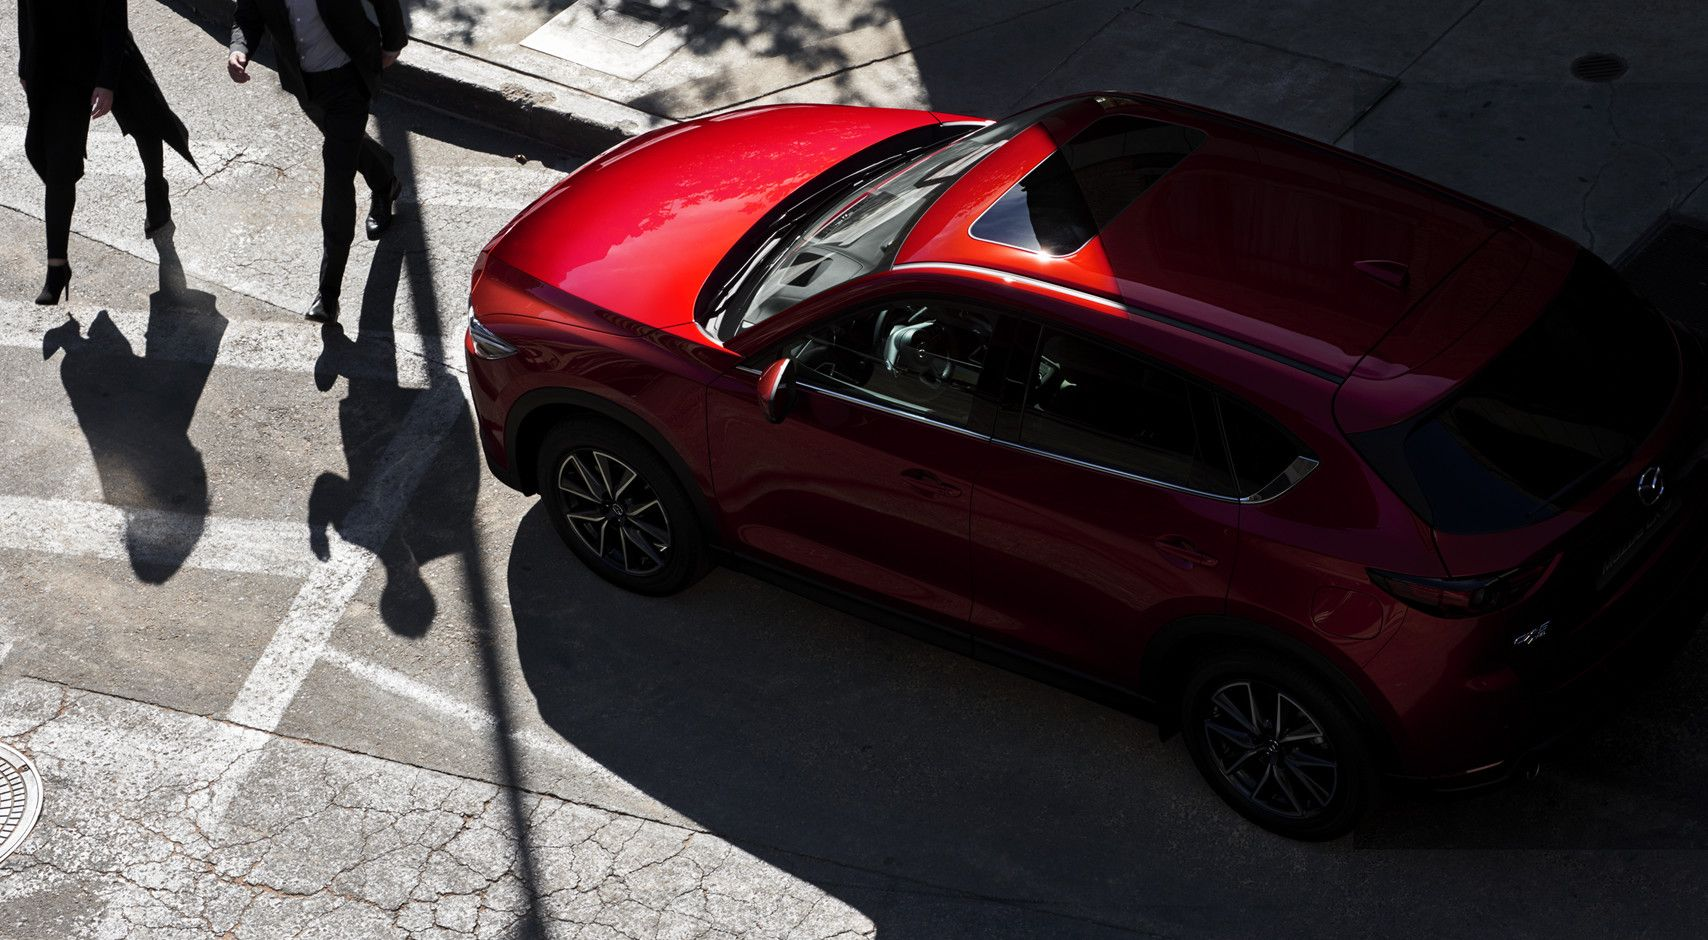 Mehr Unter Www Mazda At Modelle Mazda Cx 5 In 2020